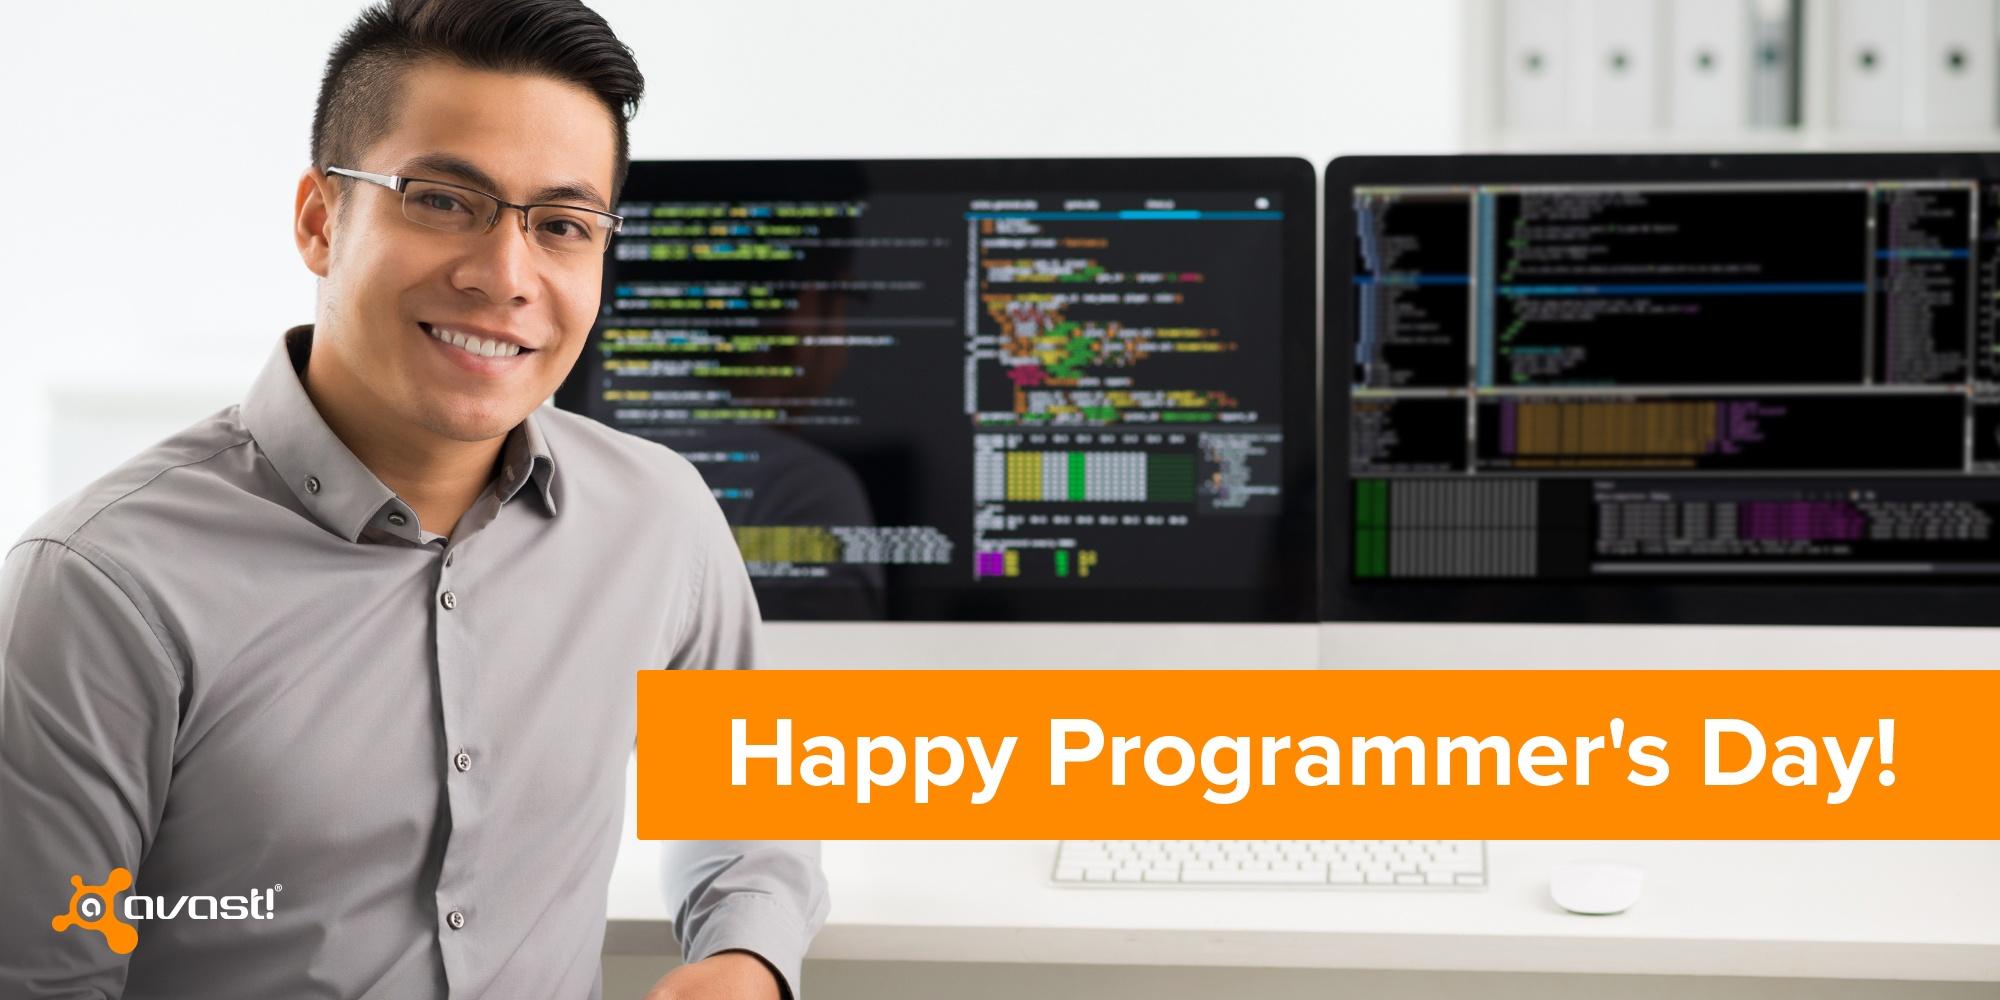 programmers-day_2016.jpg